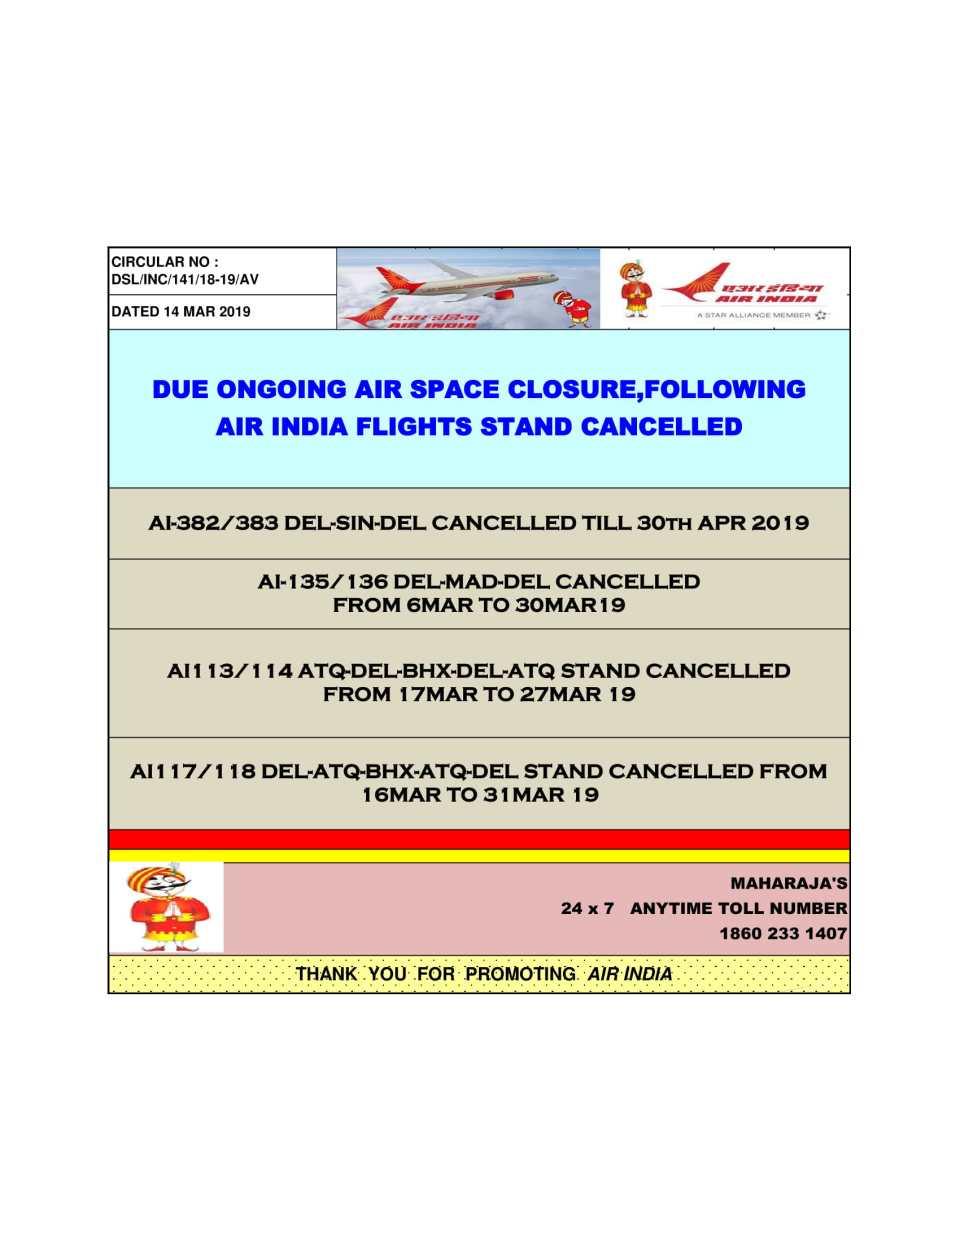 Cancelled flts due ongoing Air Space Closure (Cir 45)-1.jpg